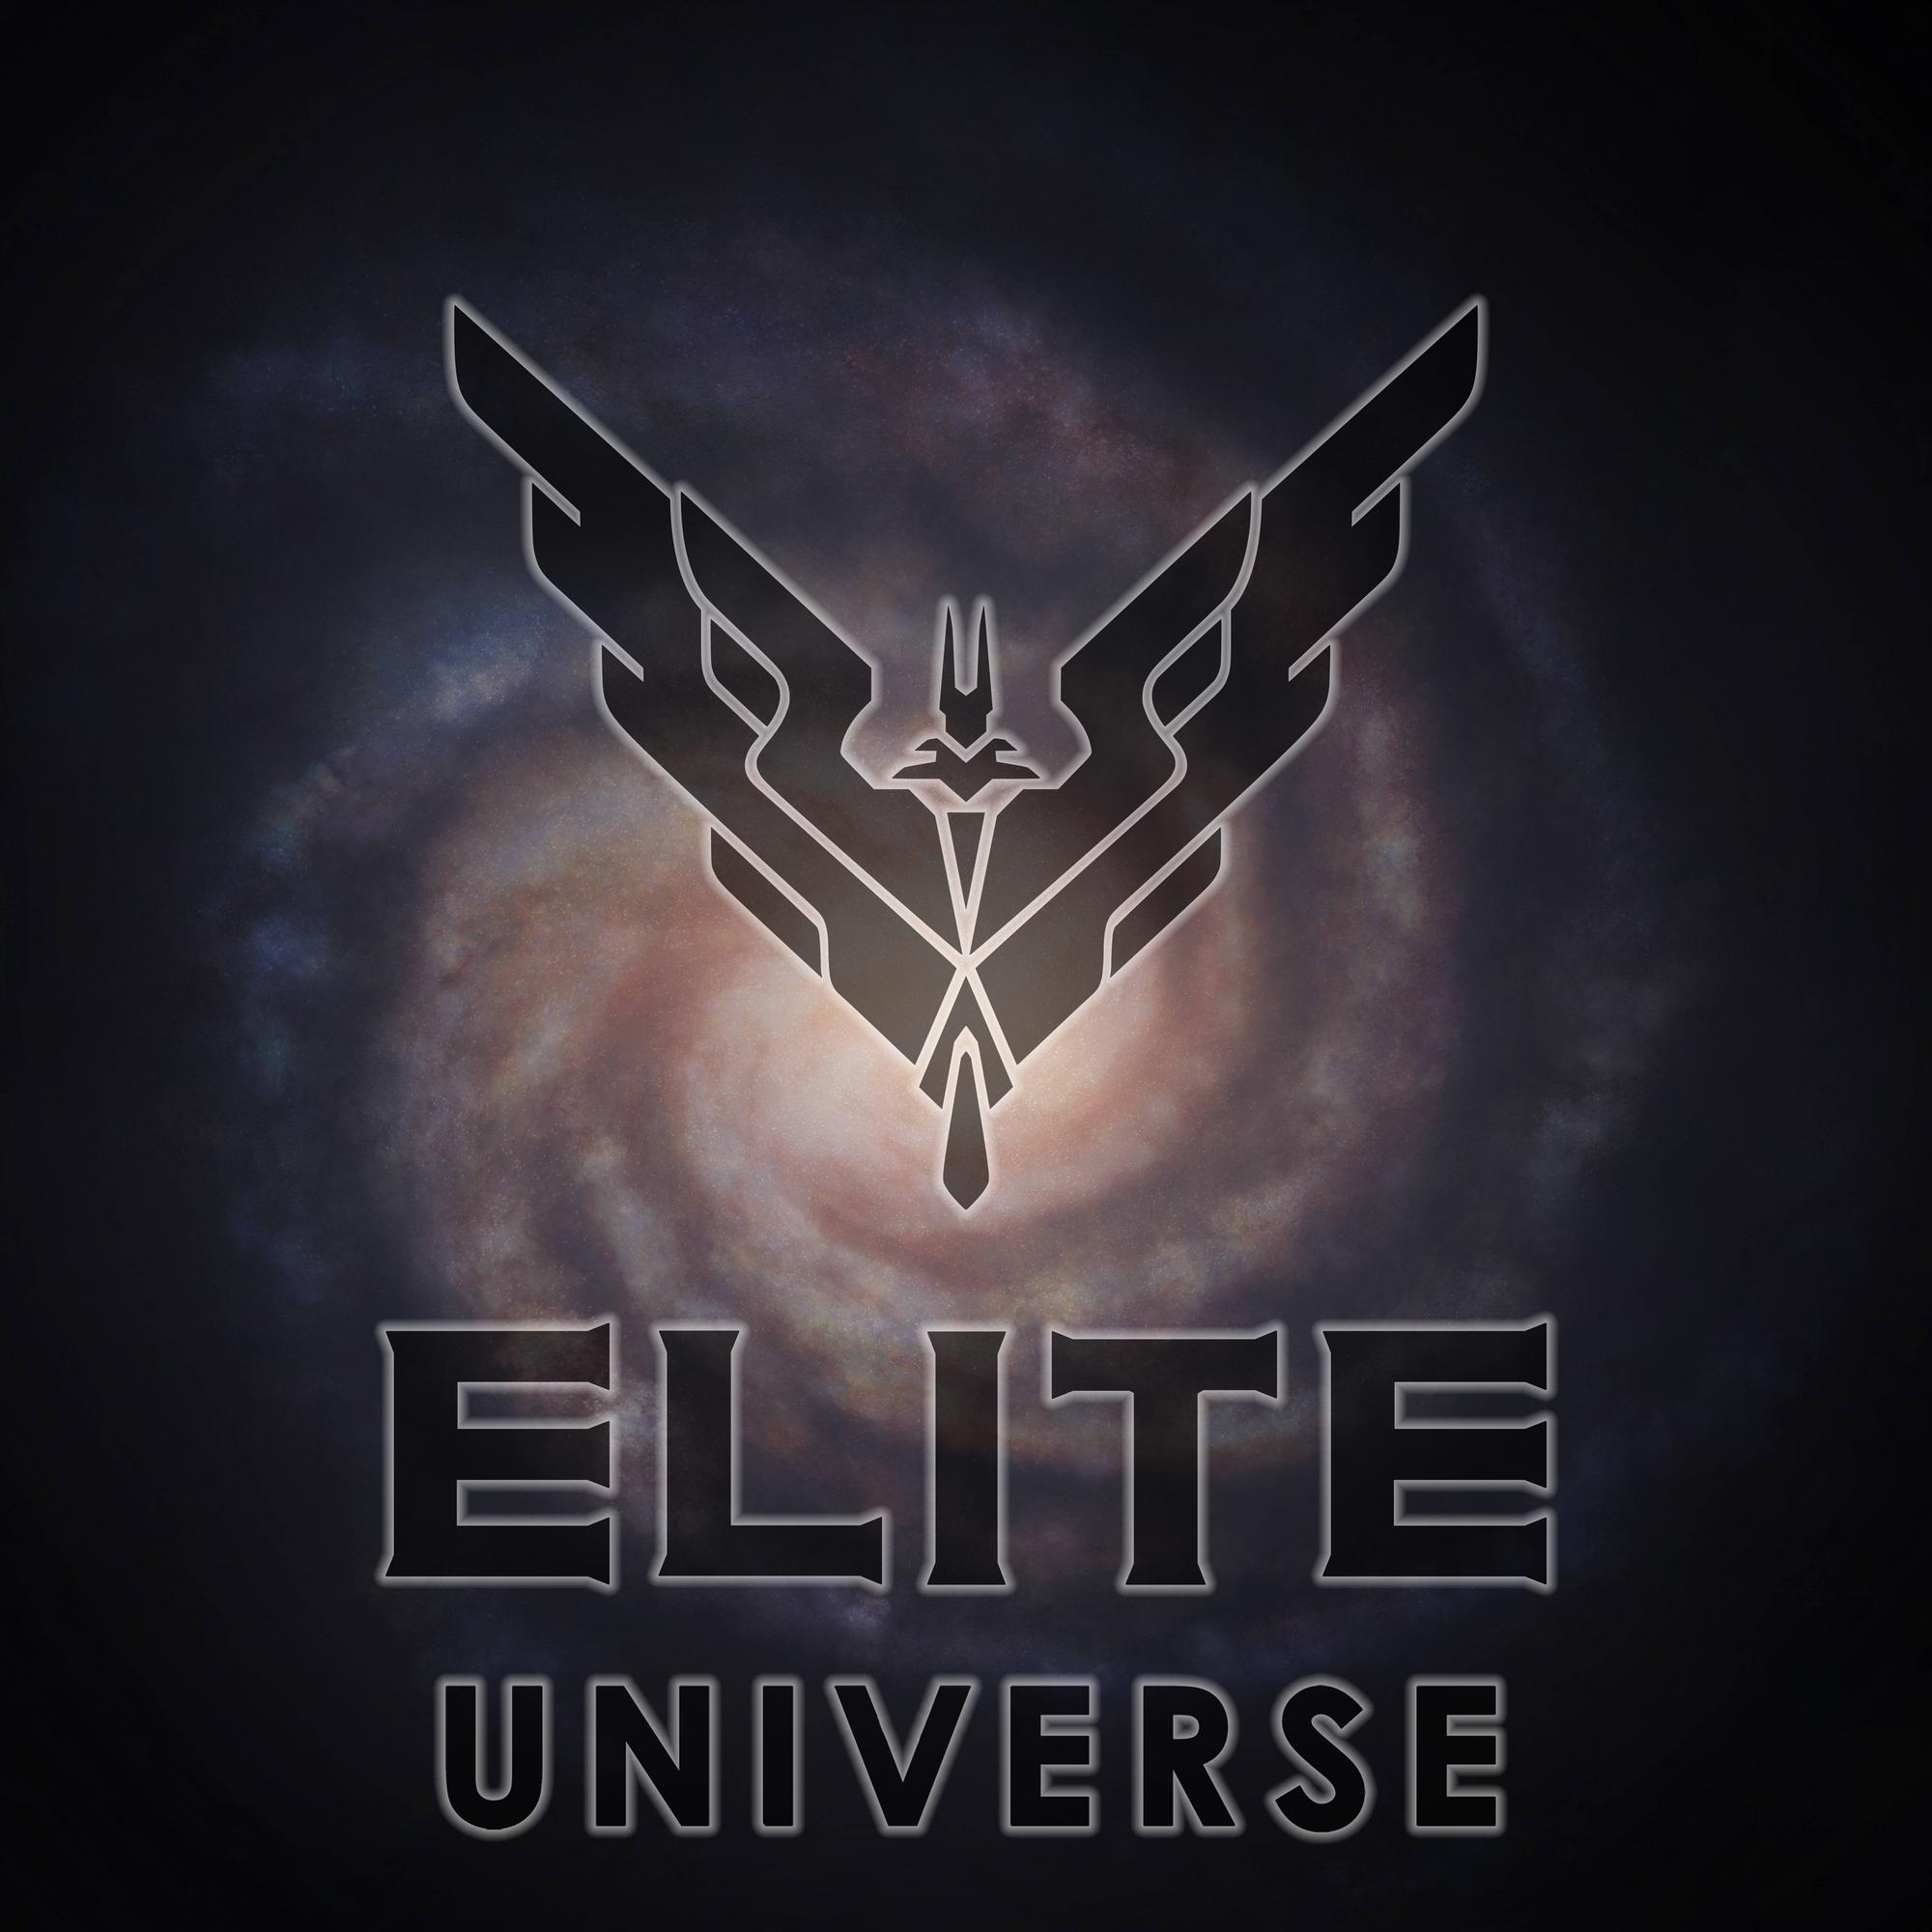 elite-dangerous.fandom.com